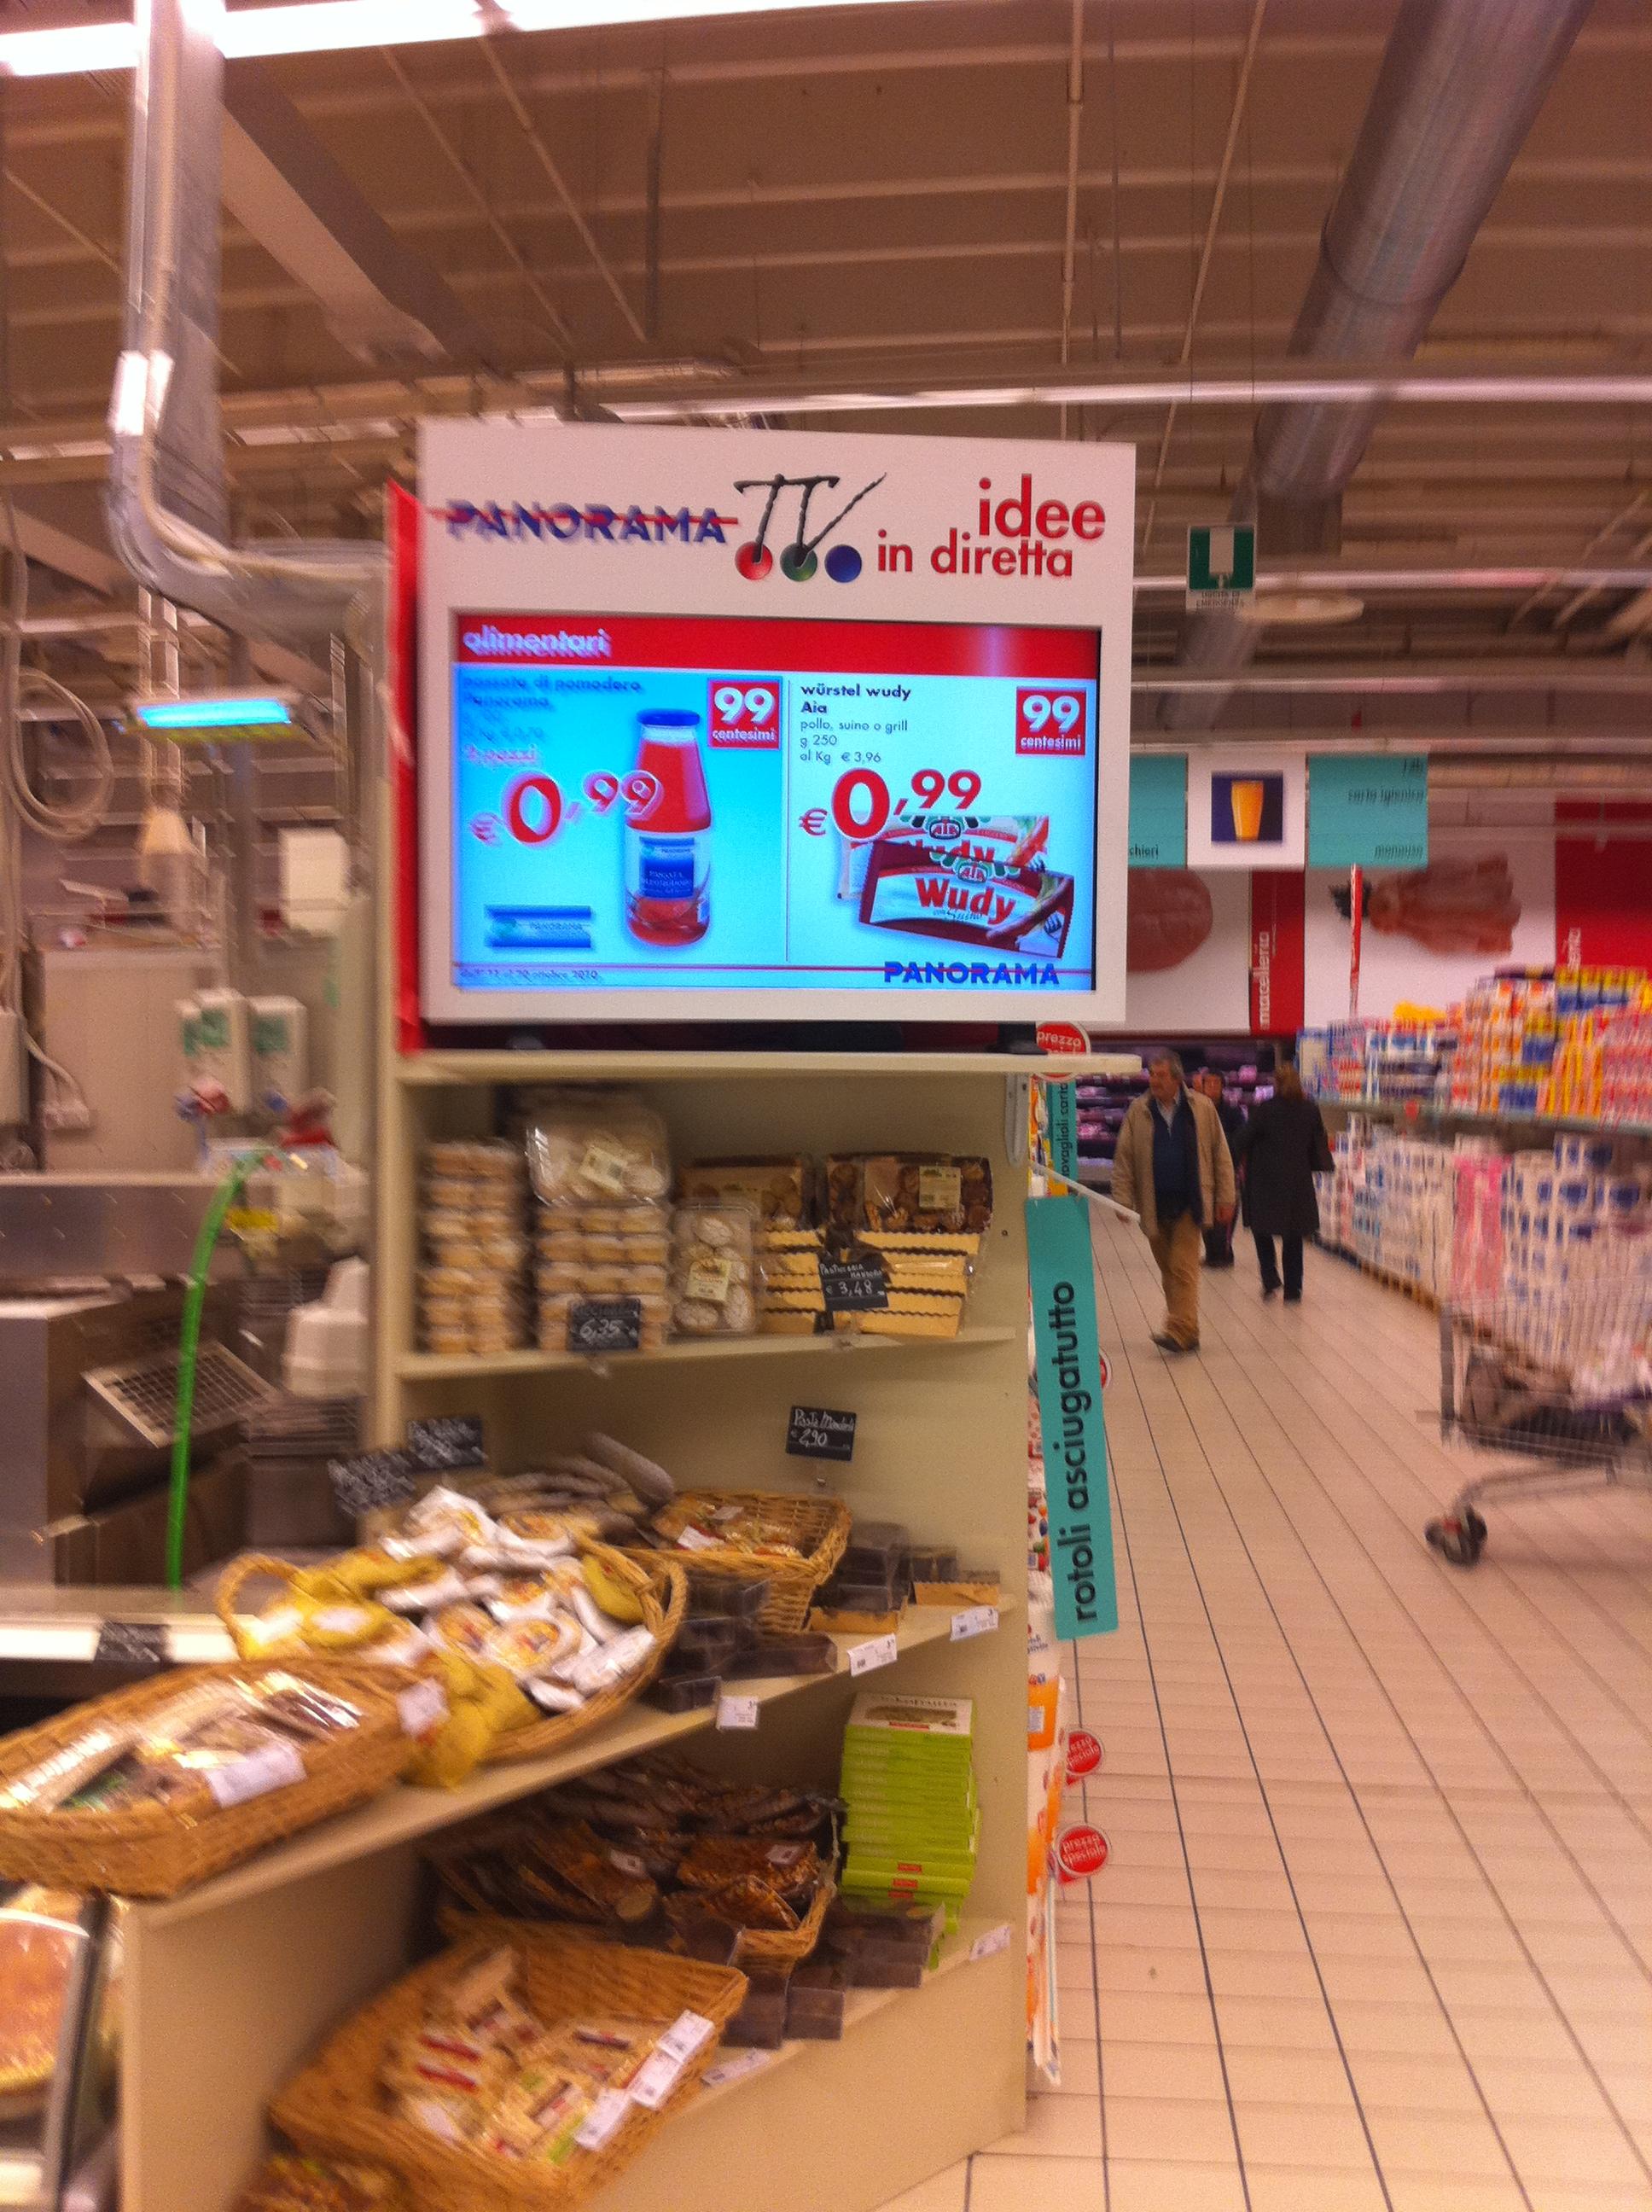 Panorama TV: digital signage al servizio del cliente